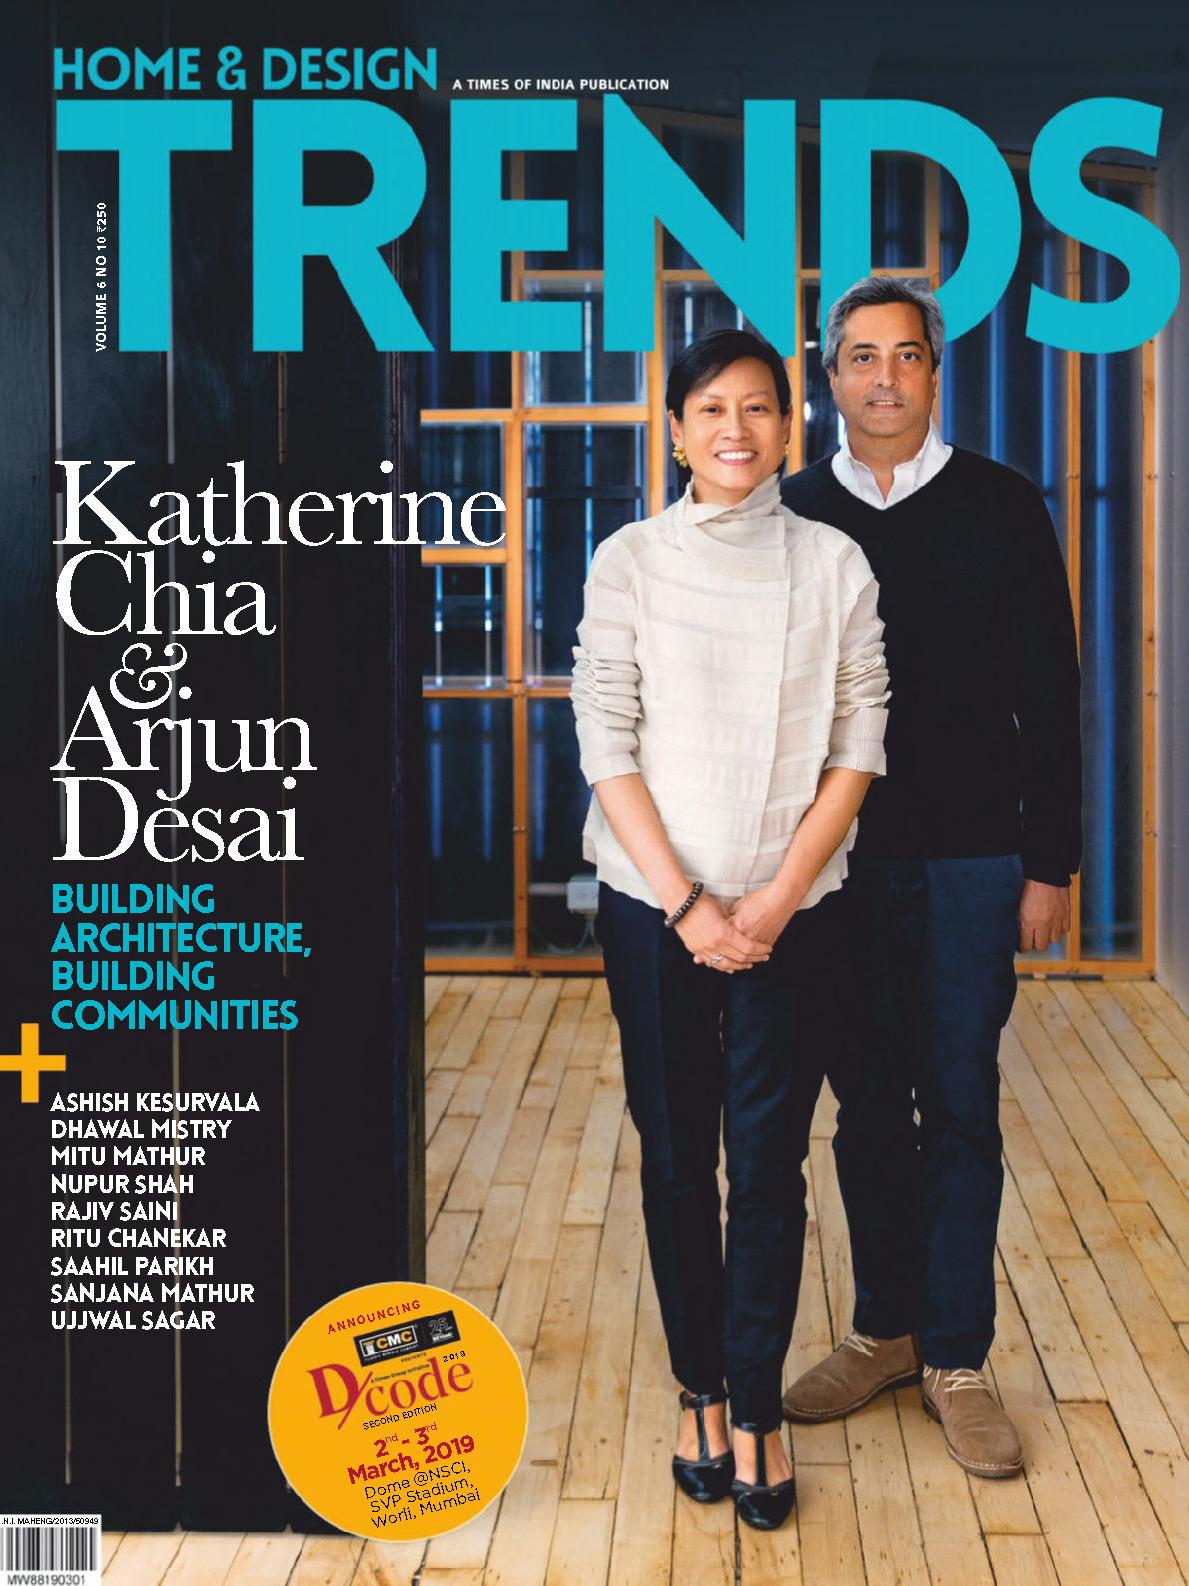 《Home & Design Trends》英国版室内设计杂志2019年03月号